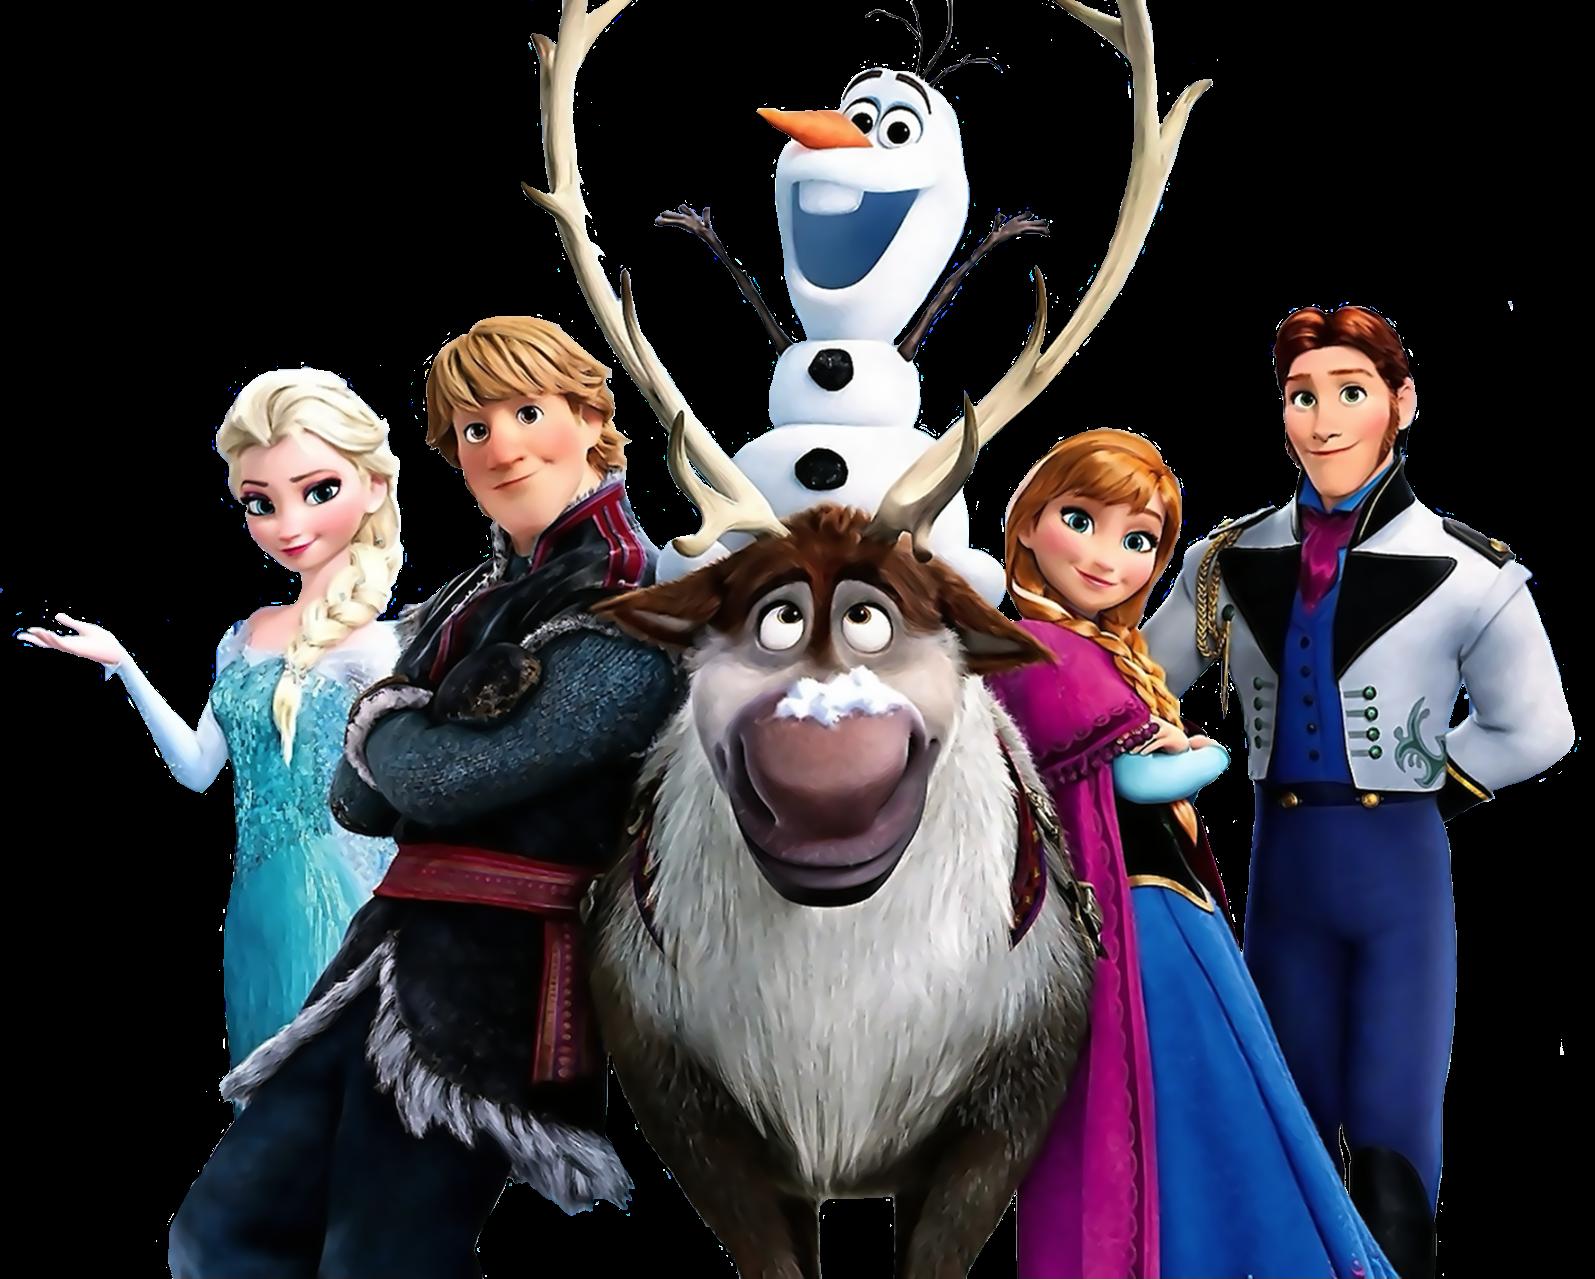 Frozen PNG Images, Elsa, Anna, Olaf Transparent Pictures.